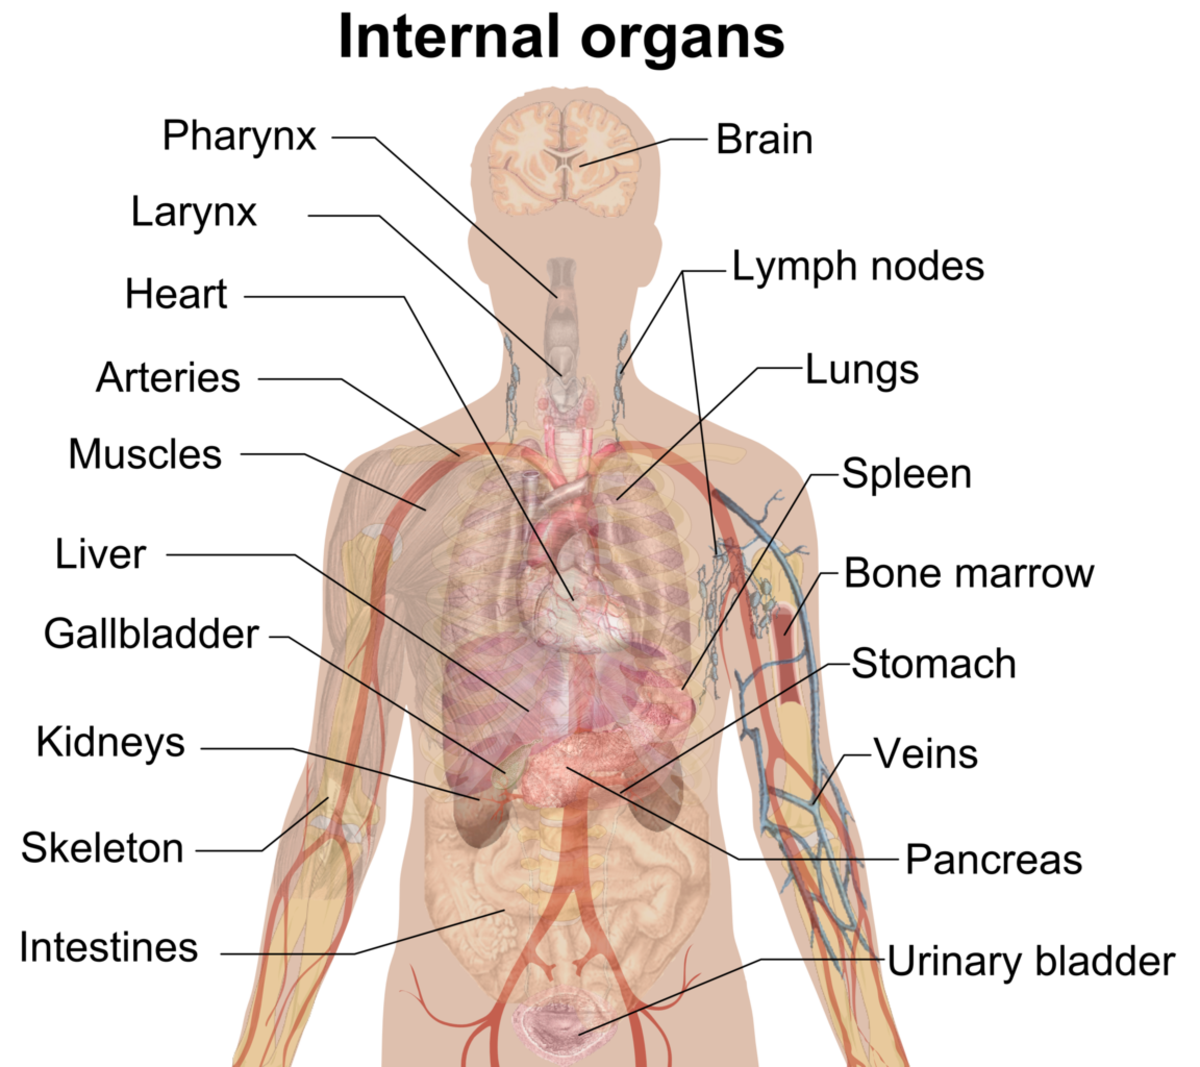 Your Internal Organs